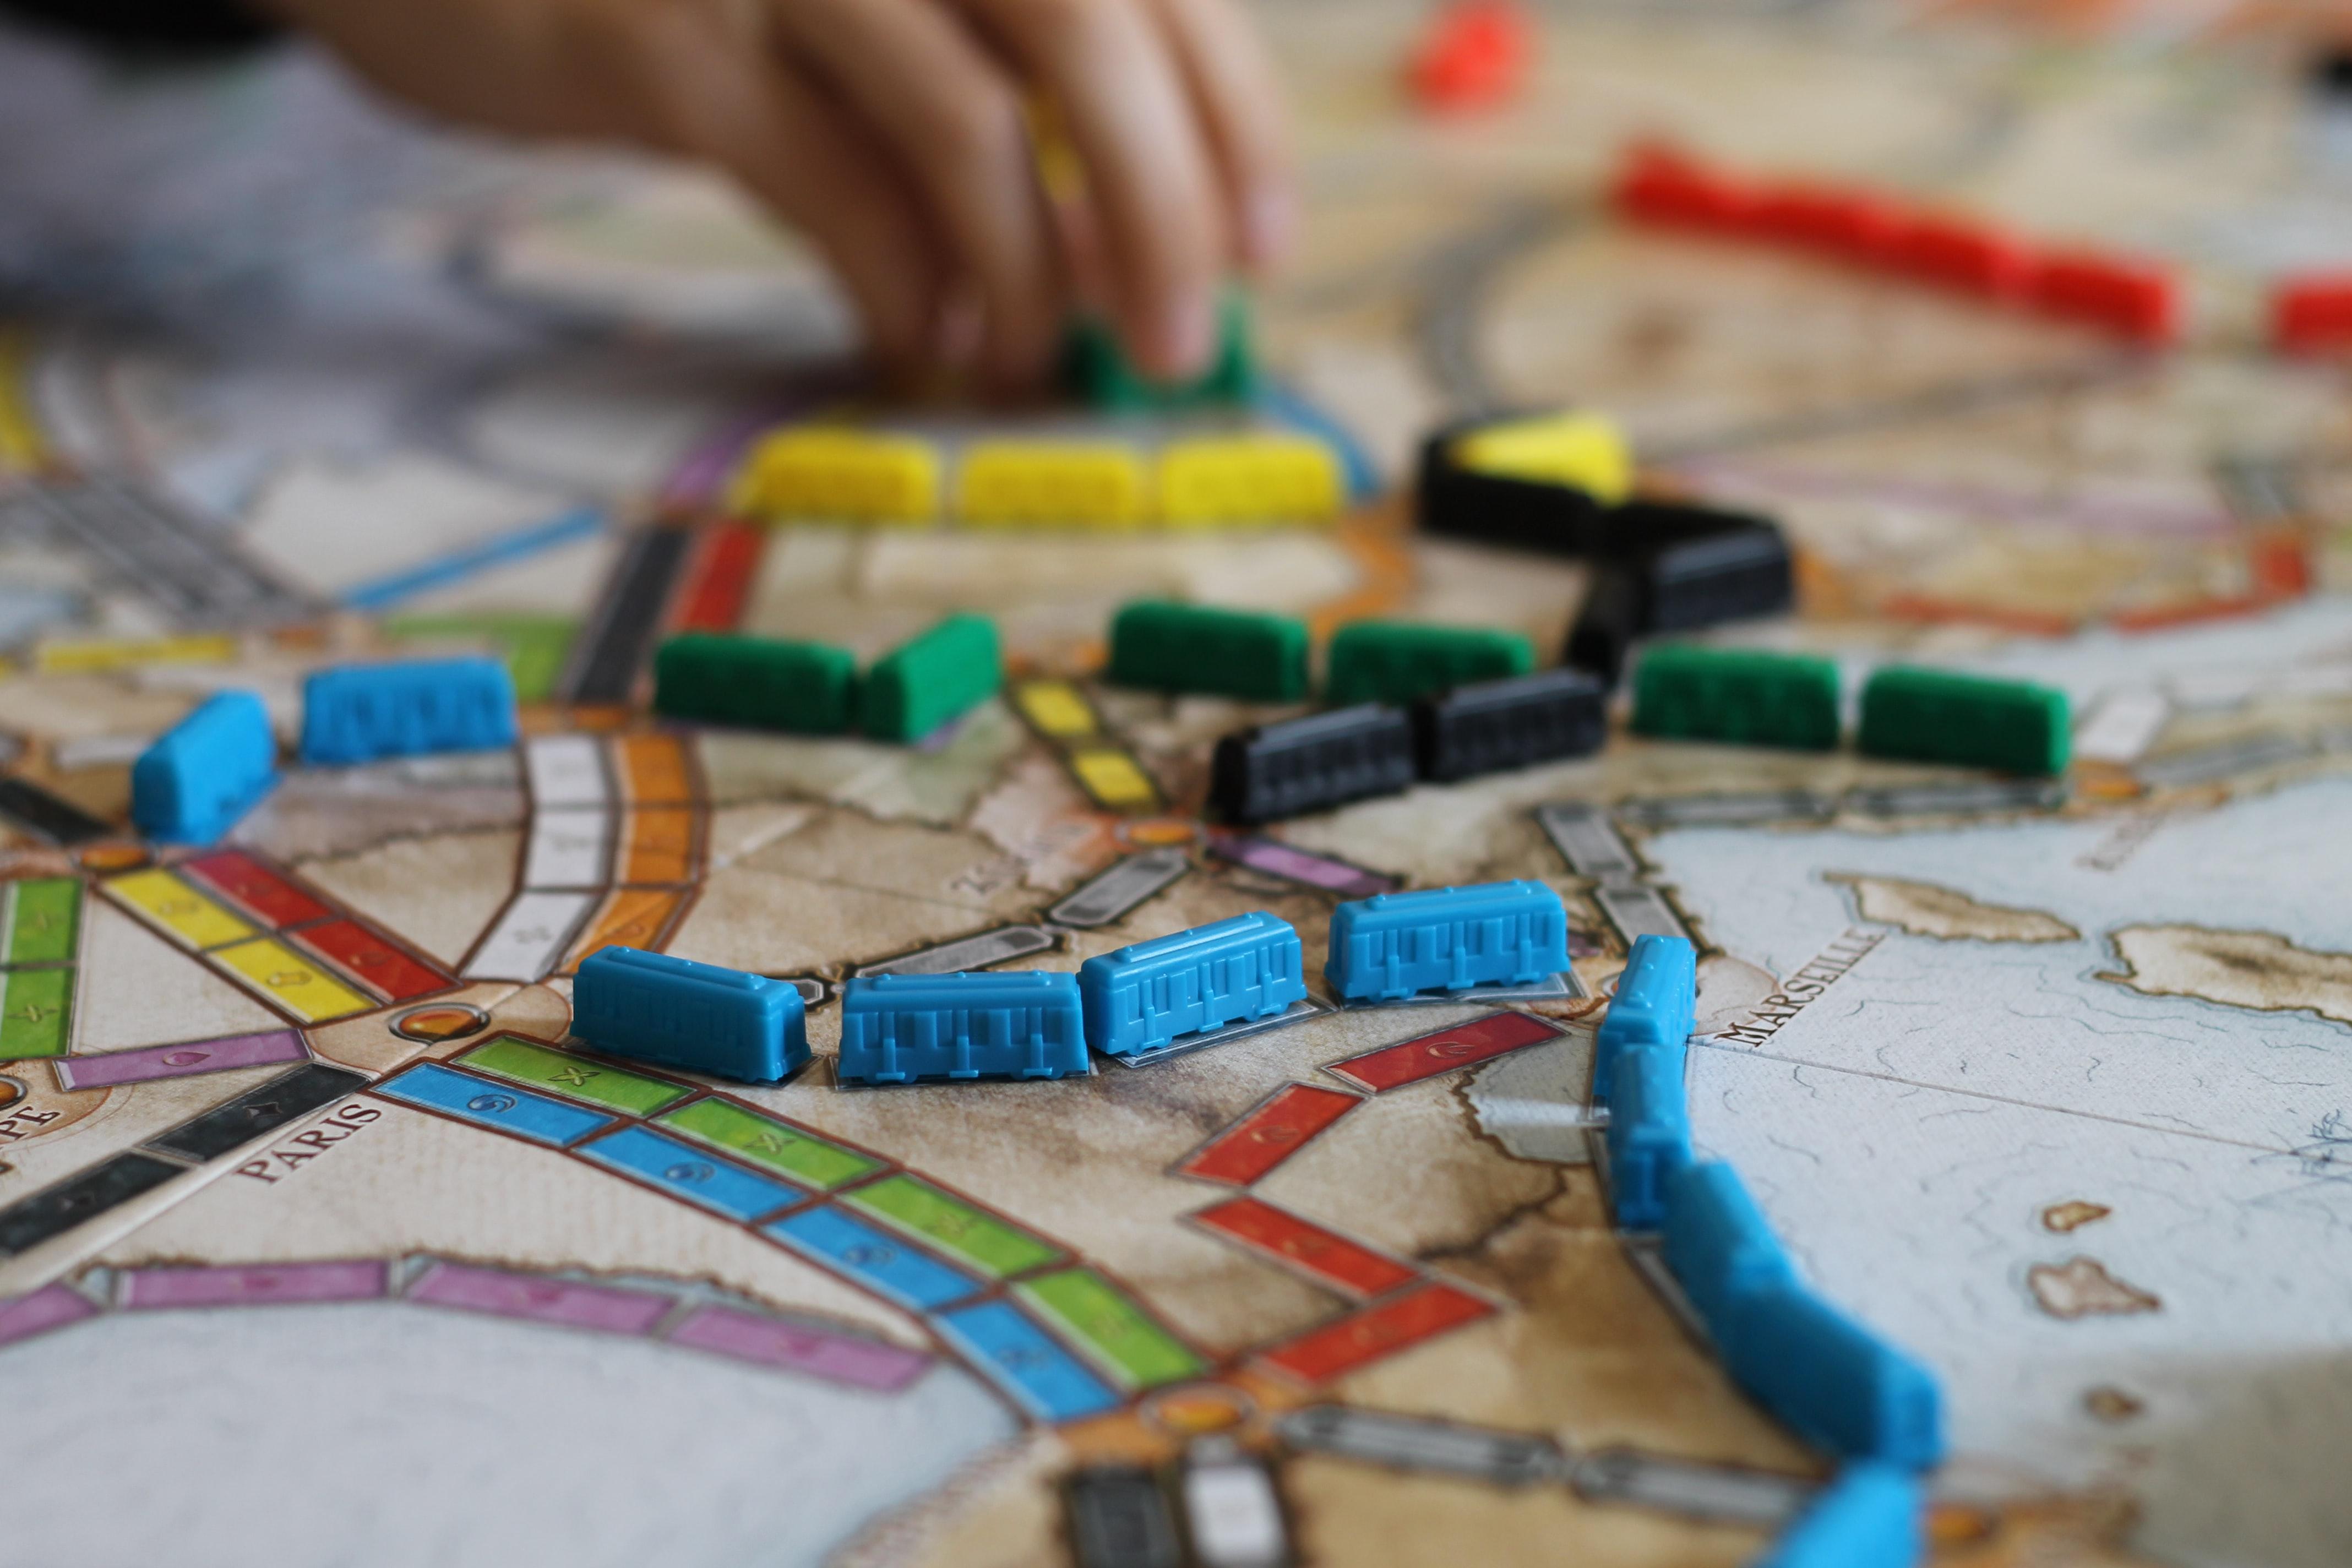 Ticket to Ride er et brettspill som passer for både unge og gamle. Foto: Dave Photoz/Unsplash